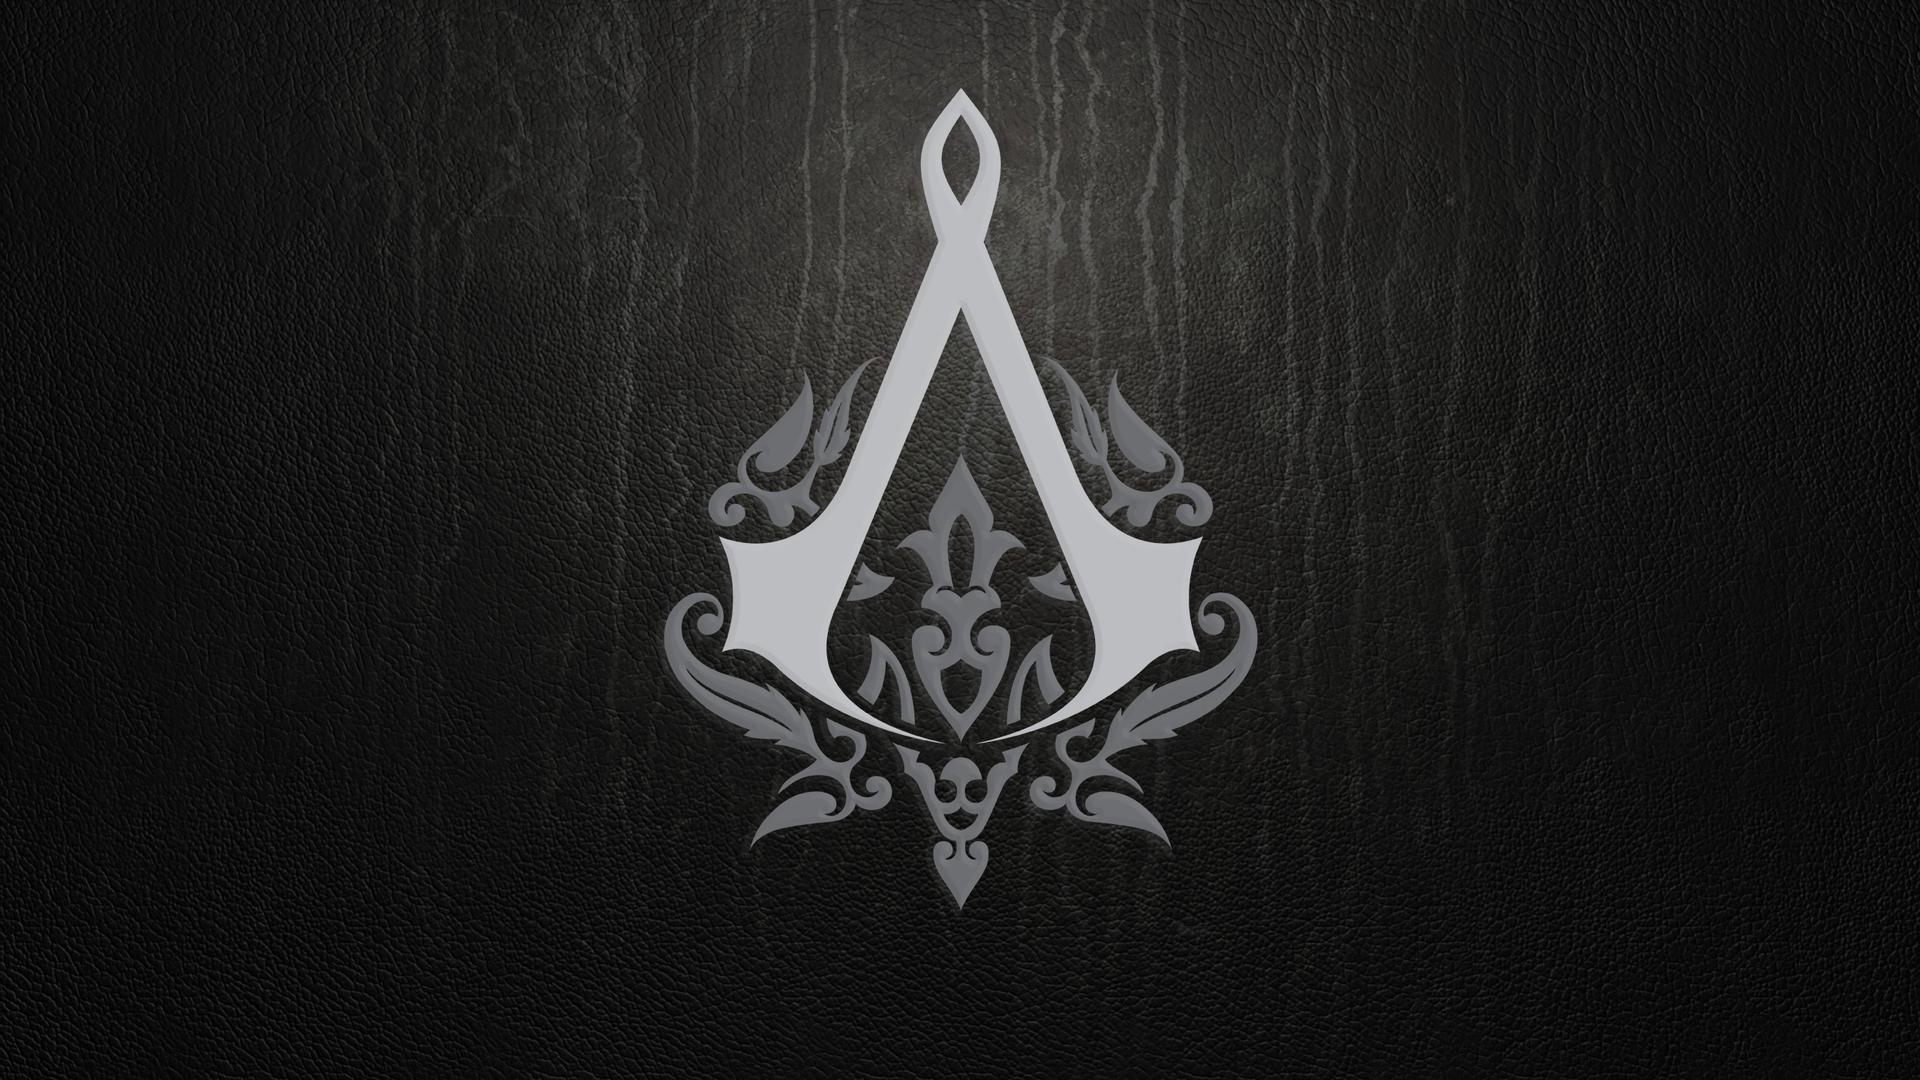 Assassins Creed Logo hd Wallpaper Assassins Creed Logo Wallpaper 1920x1080